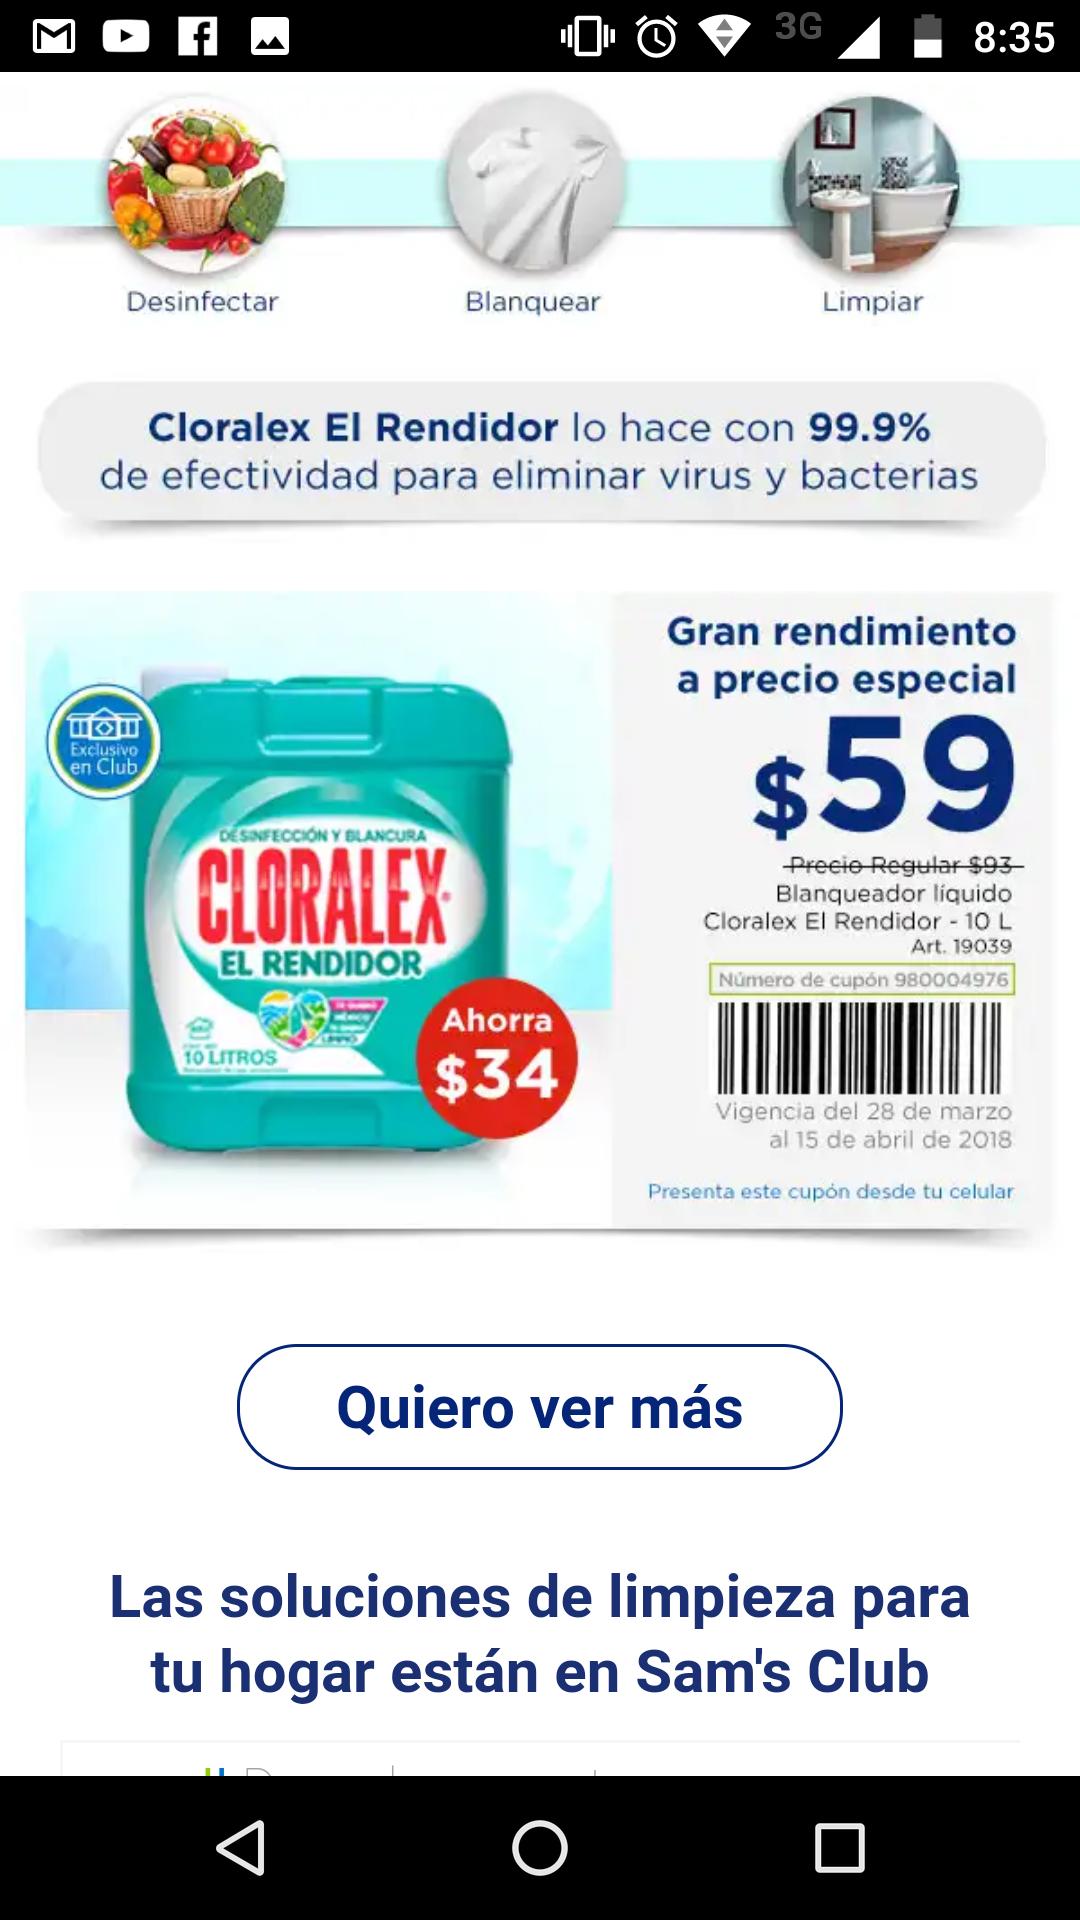 Sam's Club: cloralex 10 litros a $59 con cupón